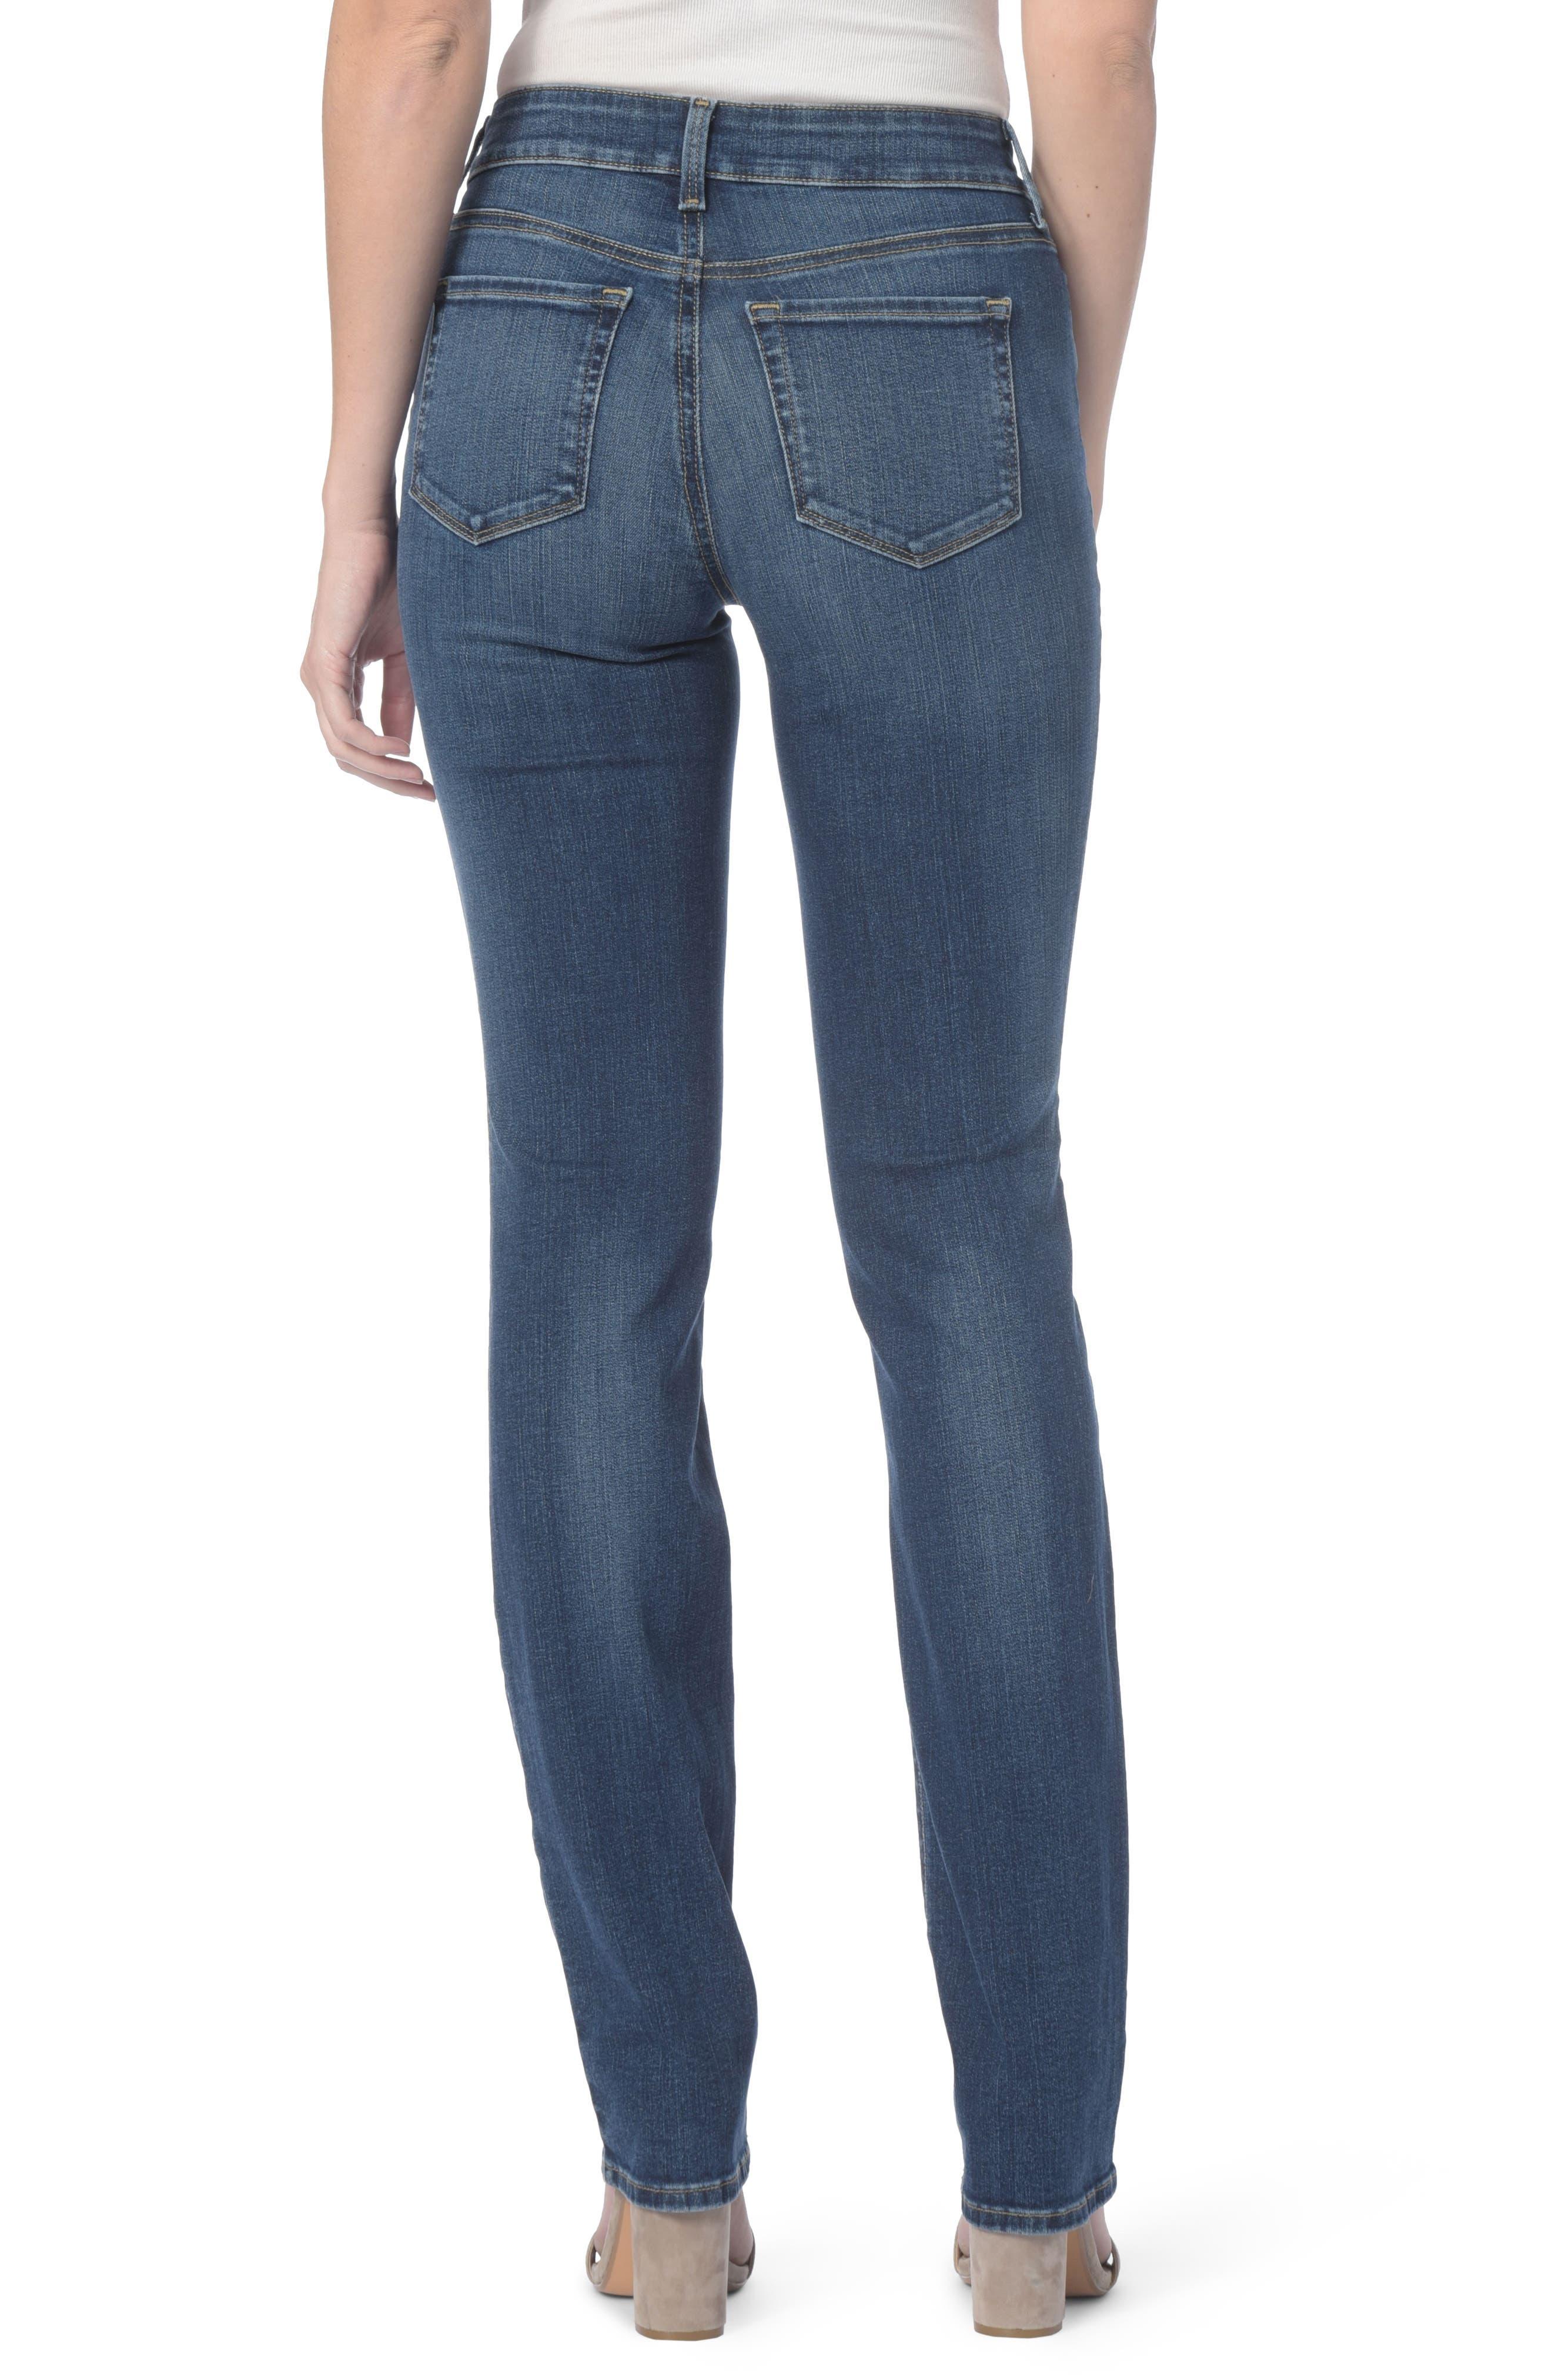 Marilyn Stretch Straight Leg Jeans,                             Alternate thumbnail 2, color,                             411